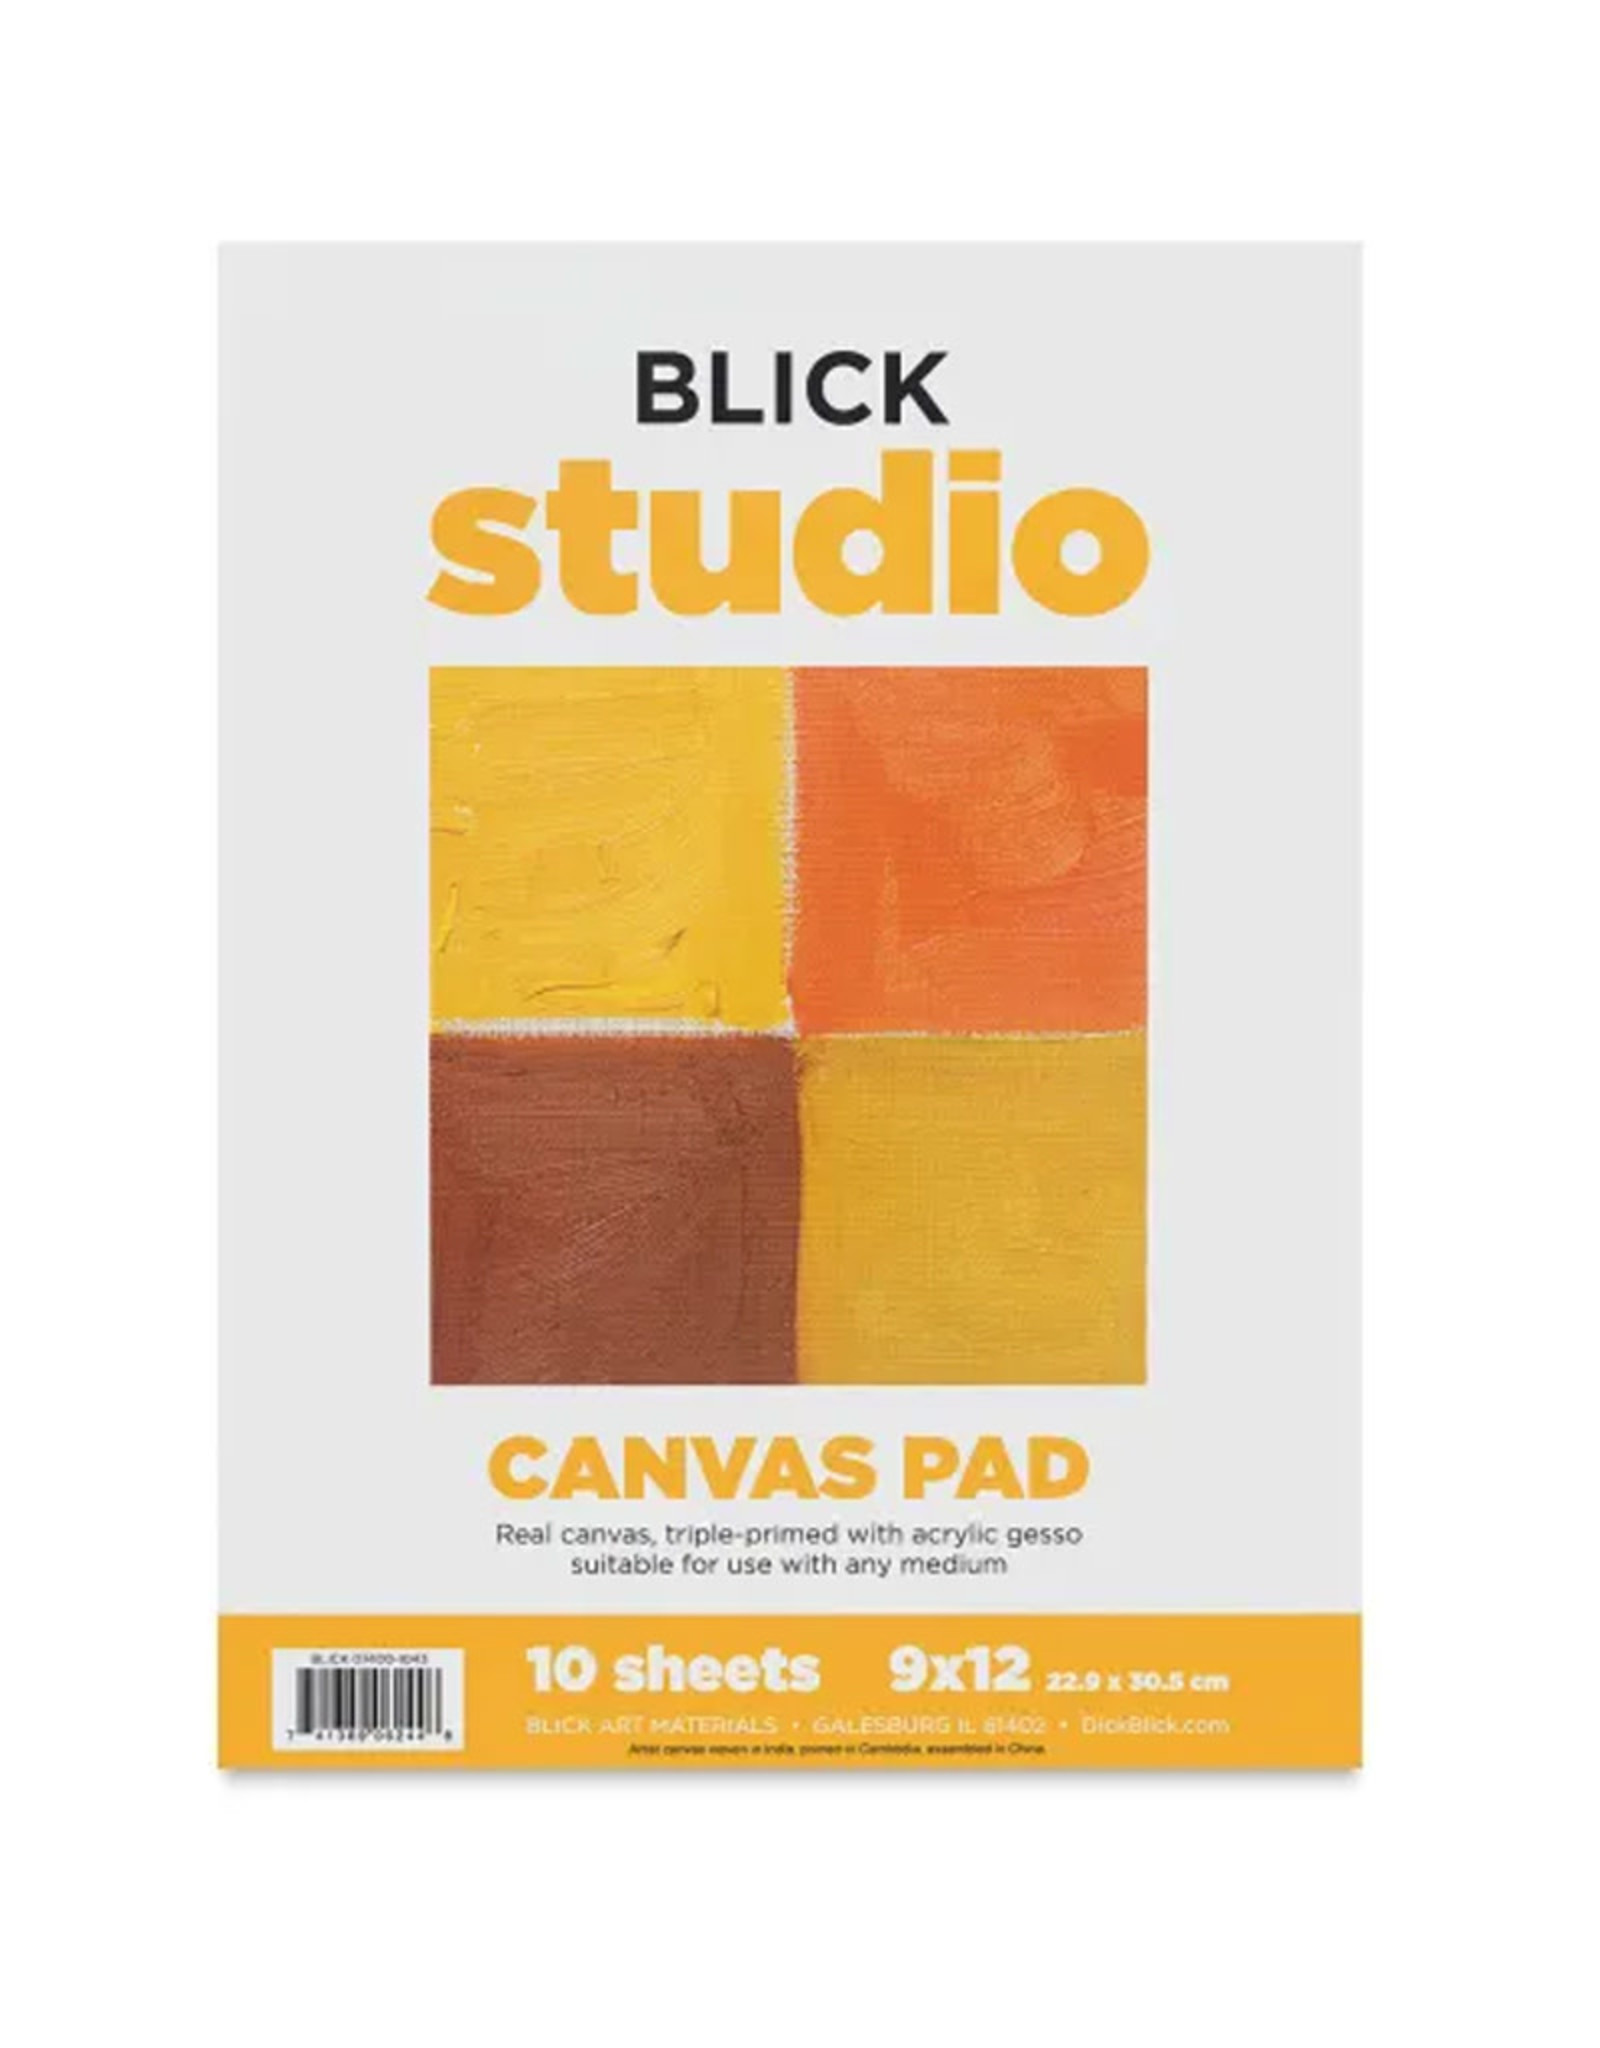 Canvas Pad 9 x 12 10 sheets Blick